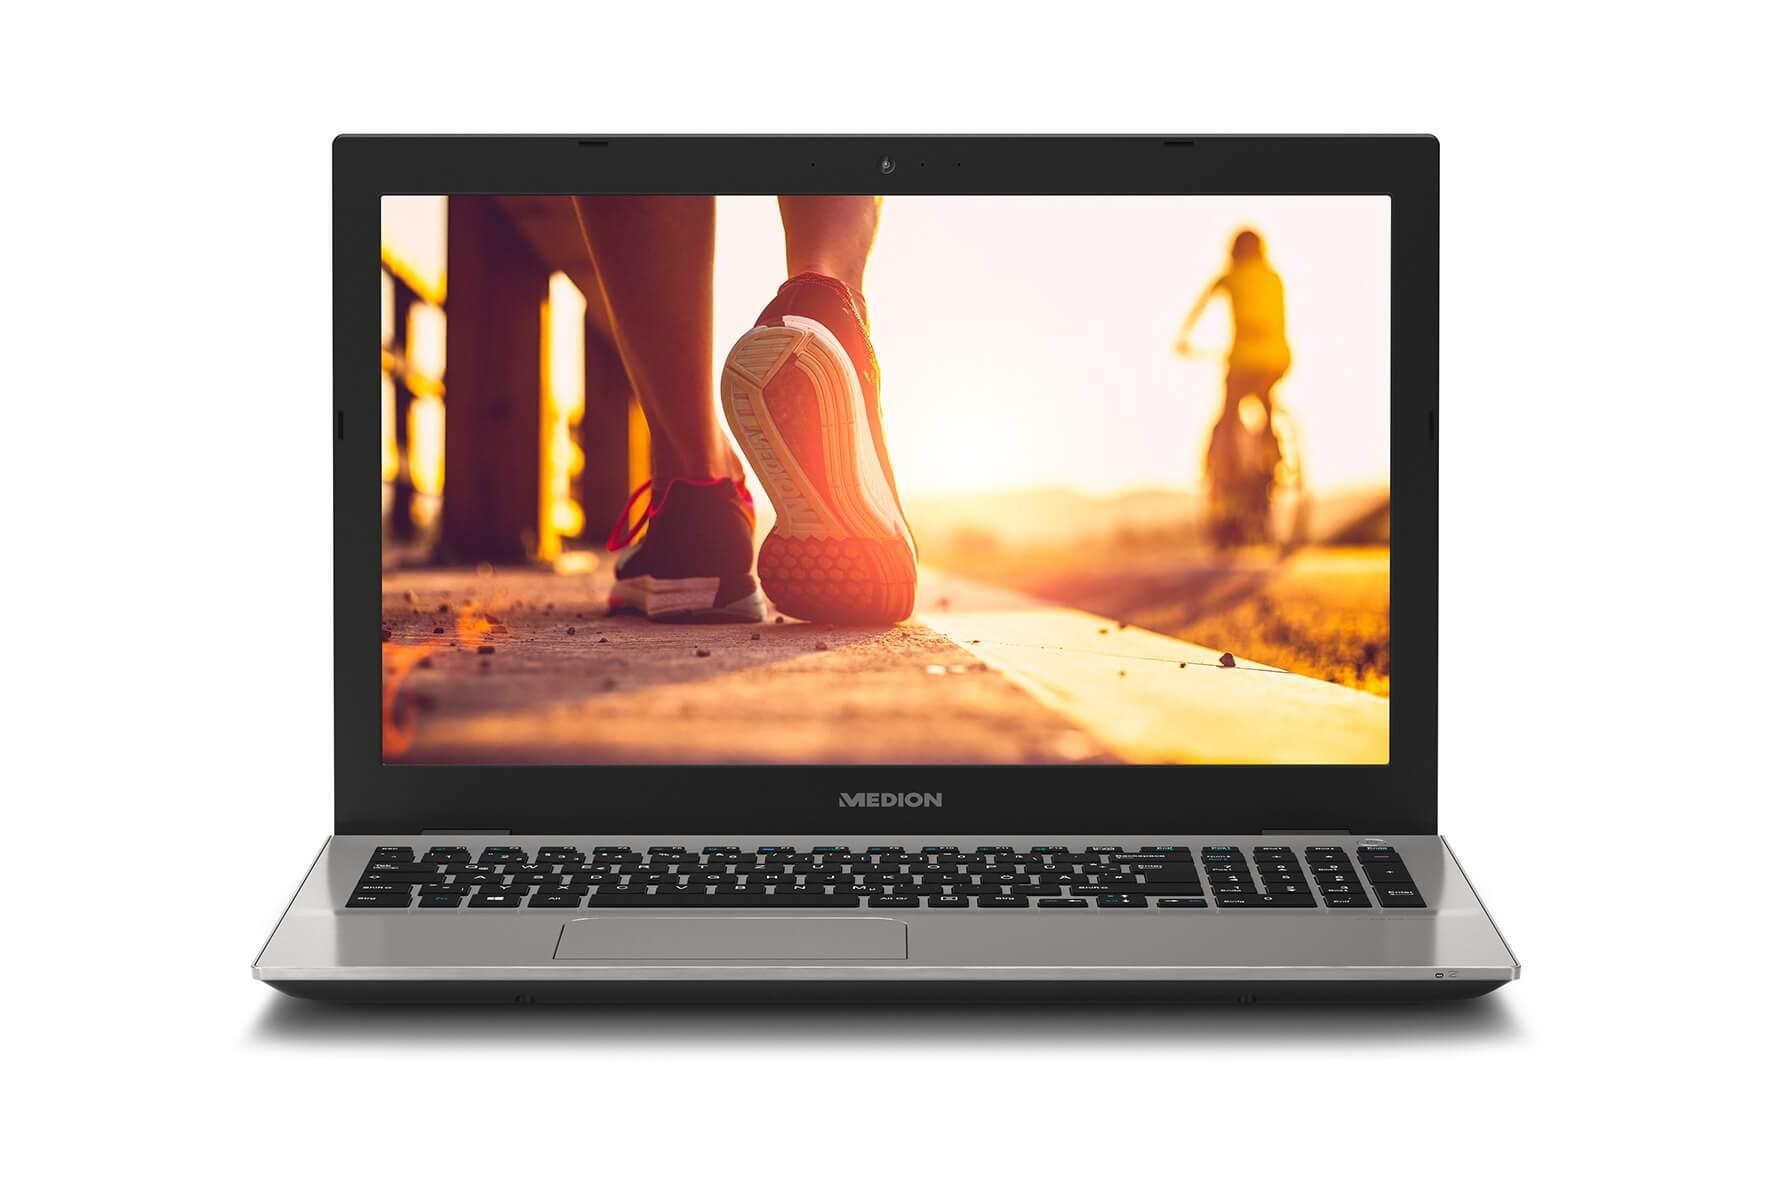 Medion S6426 Notebook